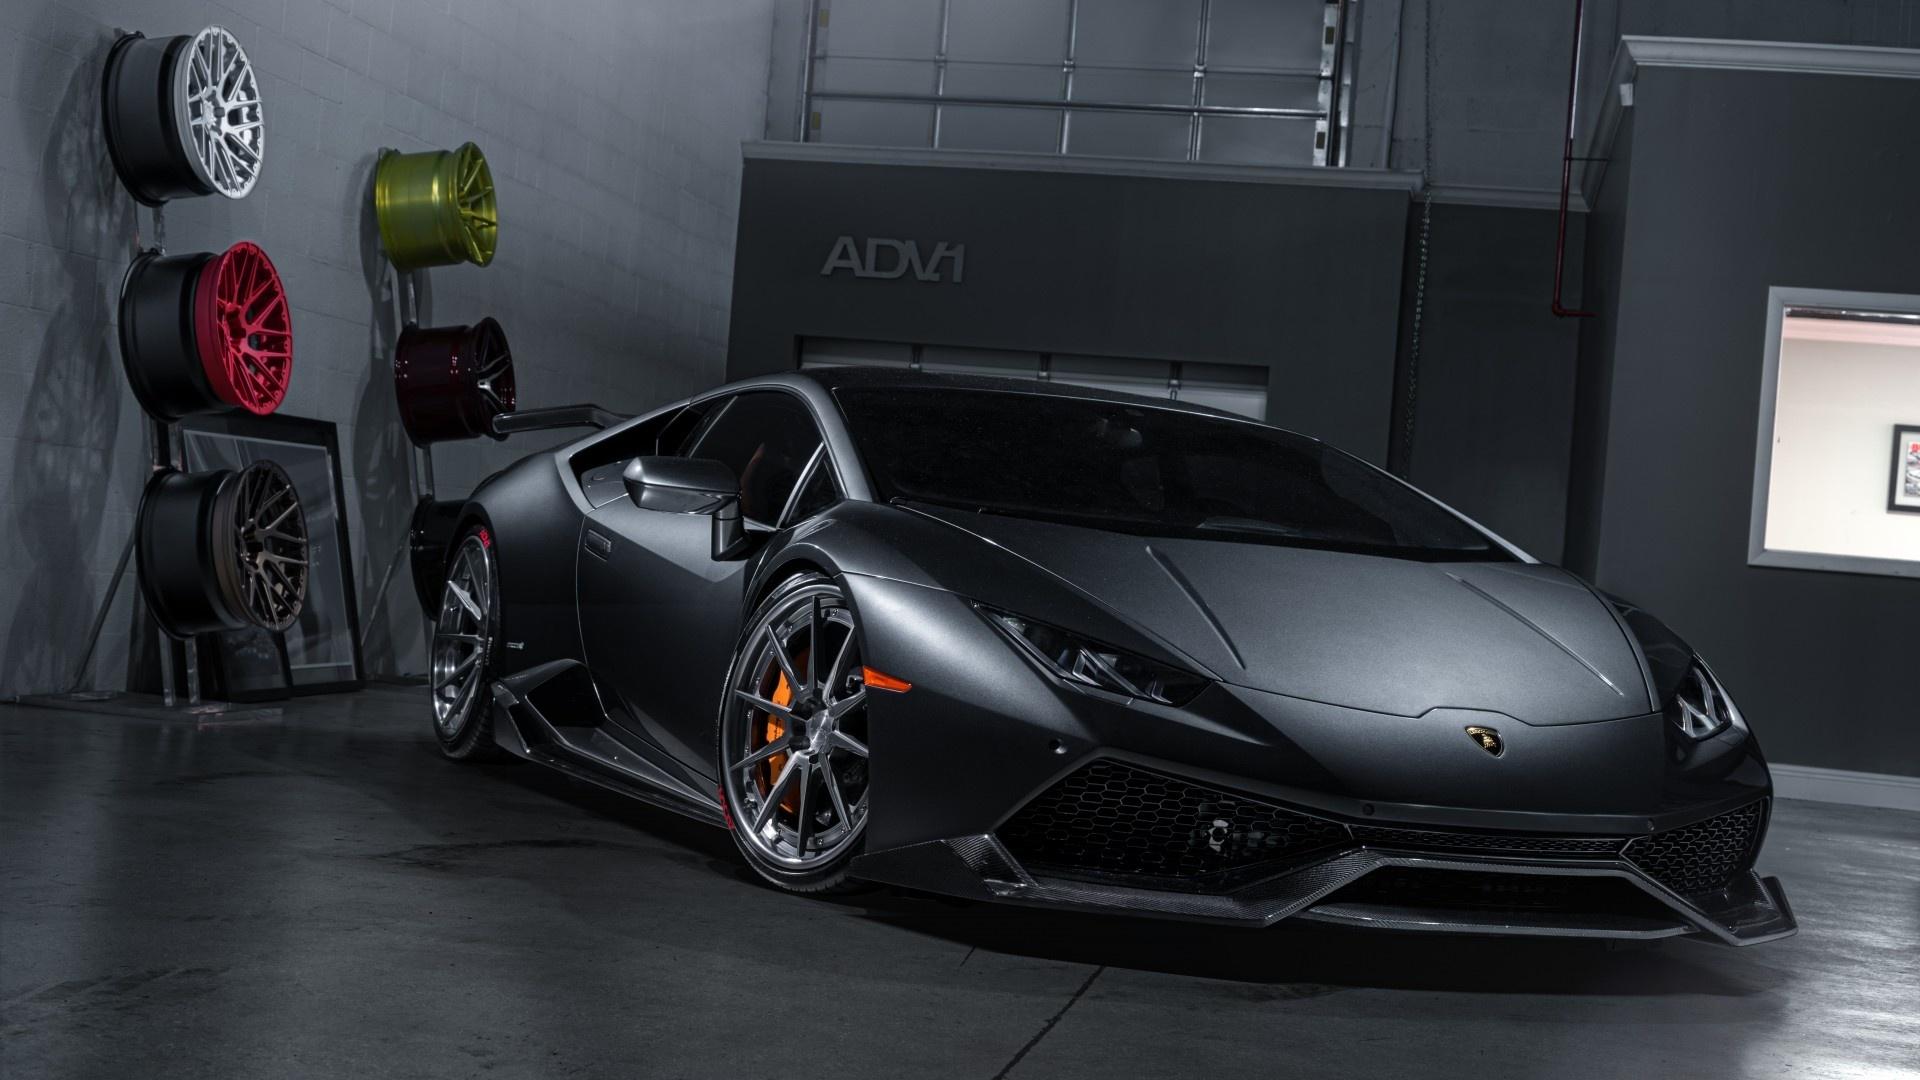 Lamborghini desktop background